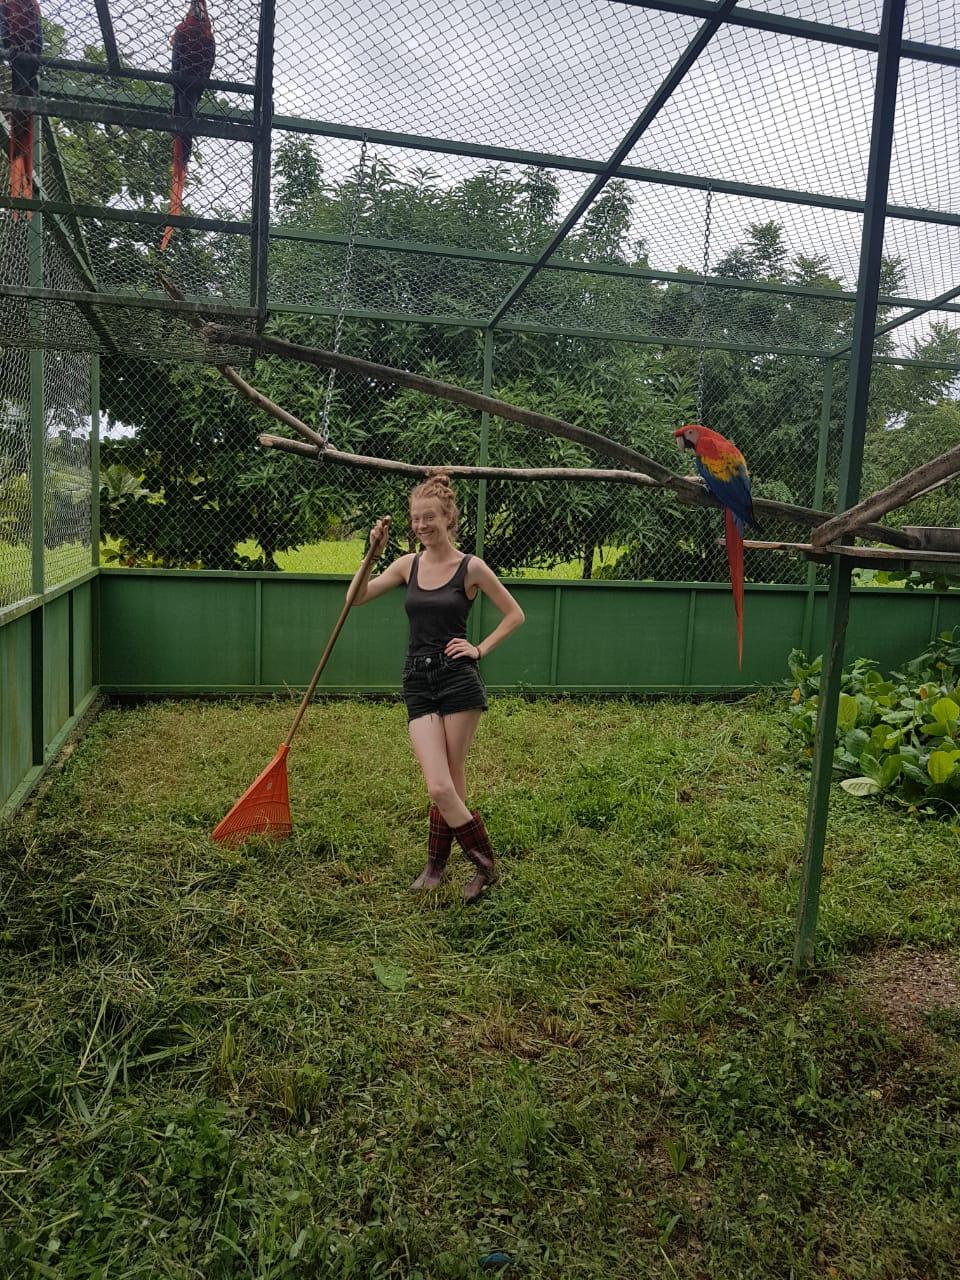 Nele volunteers to help clean an aviary.